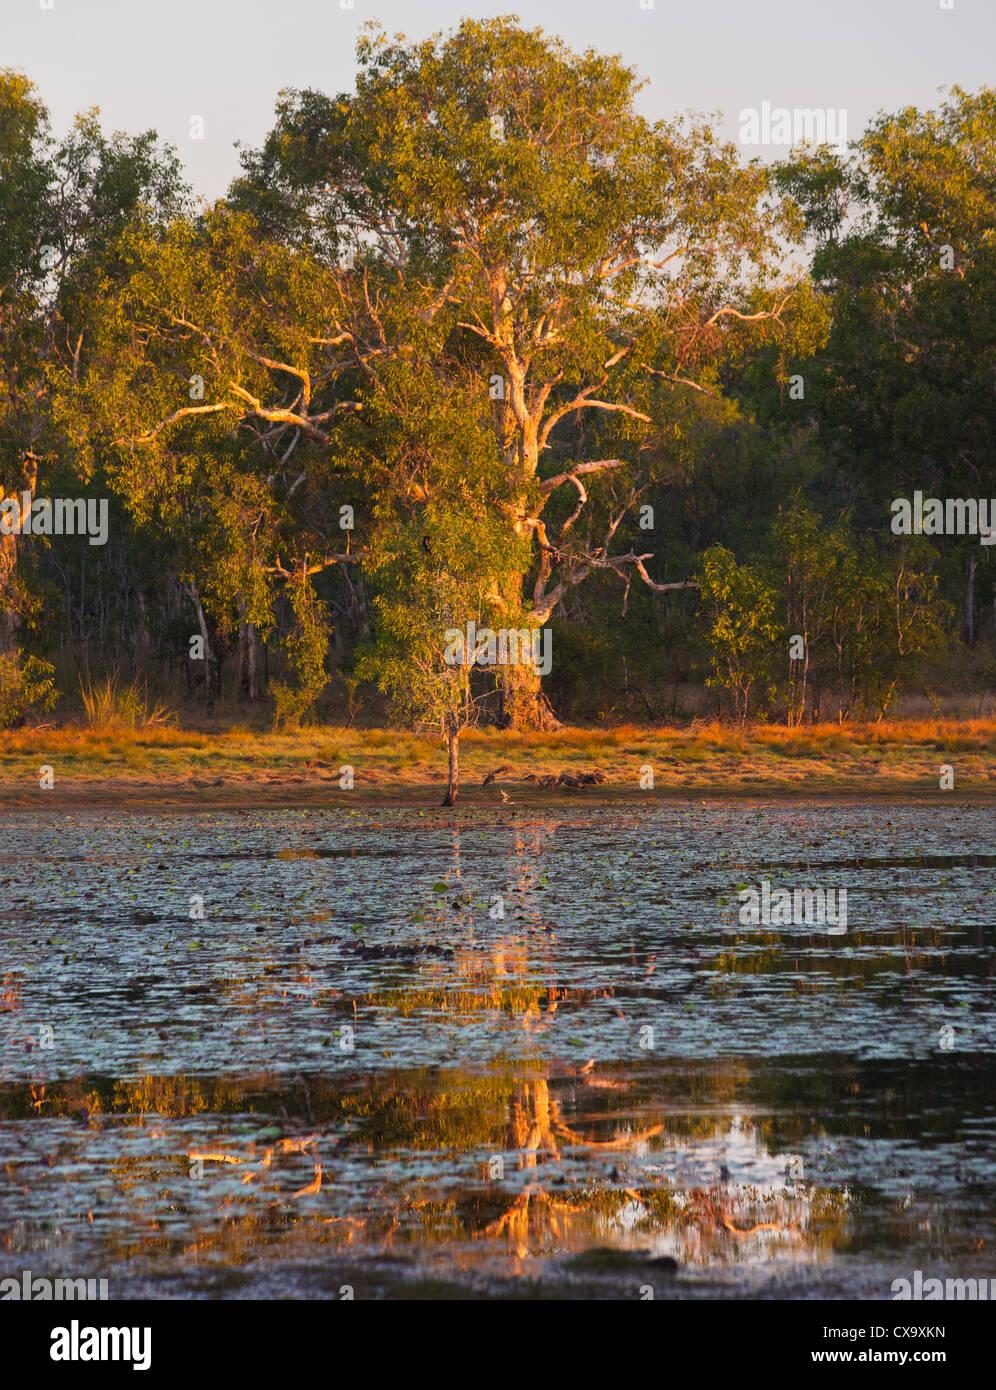 Anbangbang Billabong, Kakadu National Park, Northern Territory - Stock Image